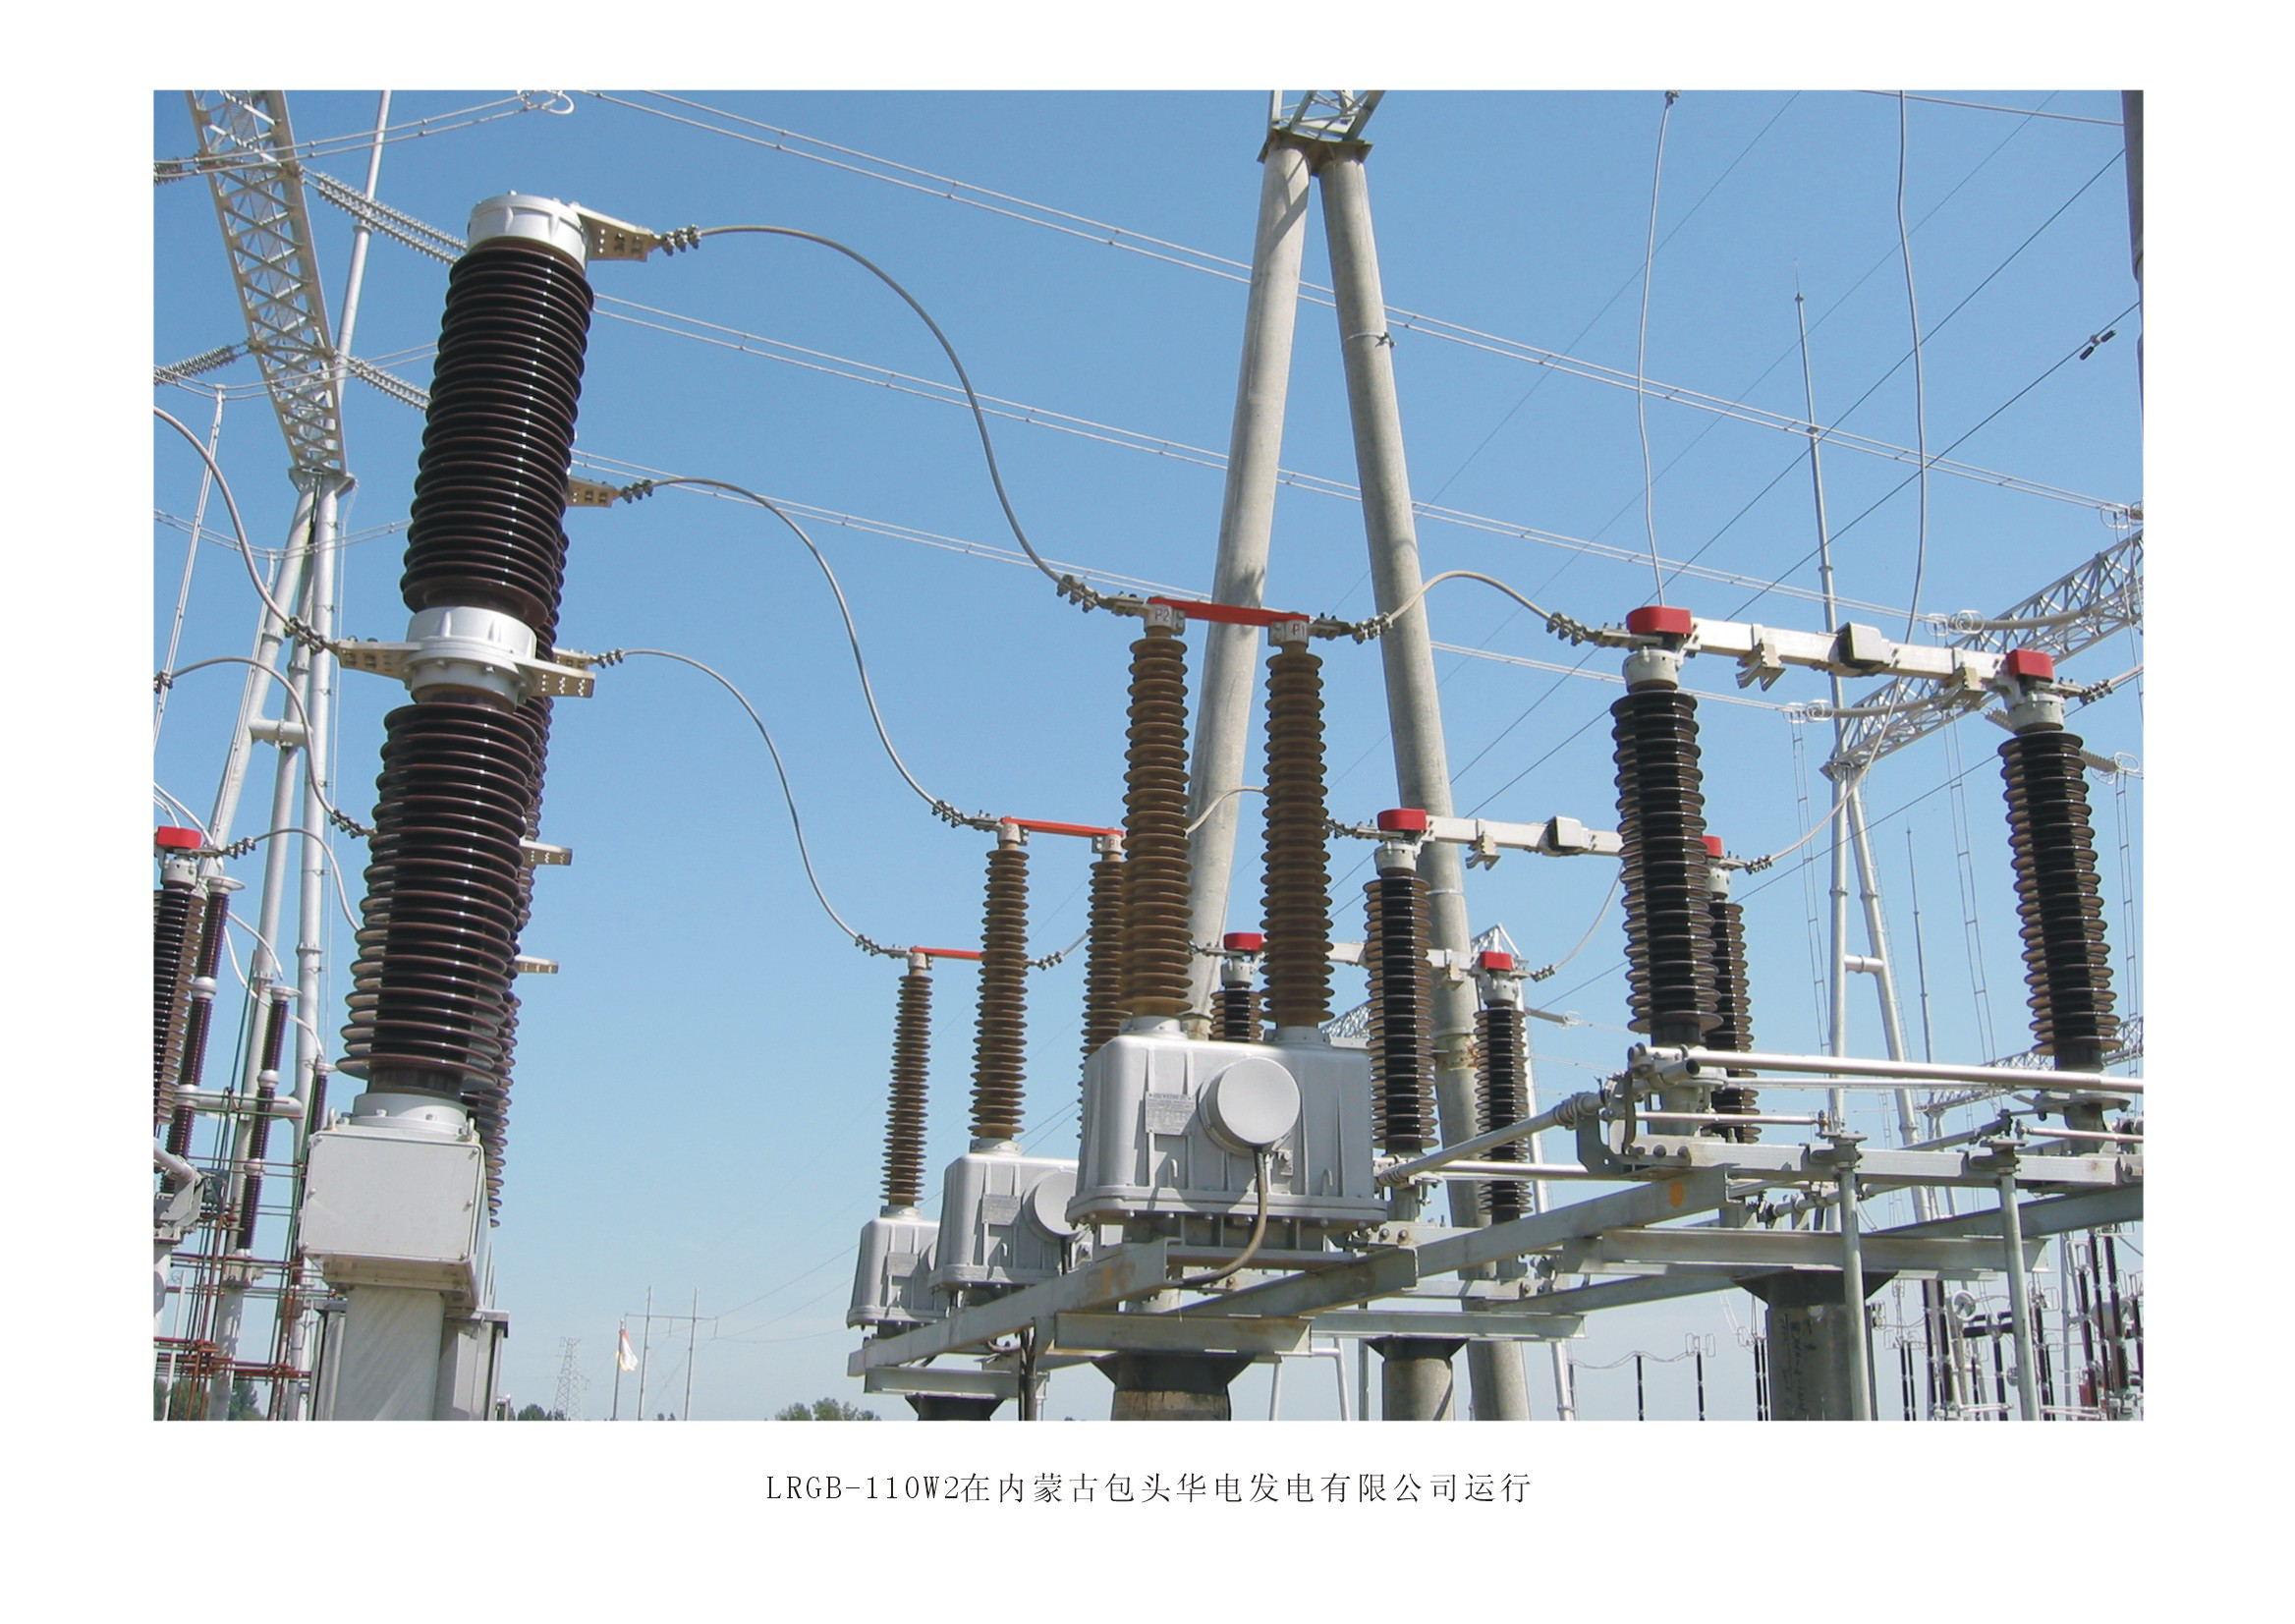 53LRGB-110W2在內蒙古包頭華電發電有限公司運行